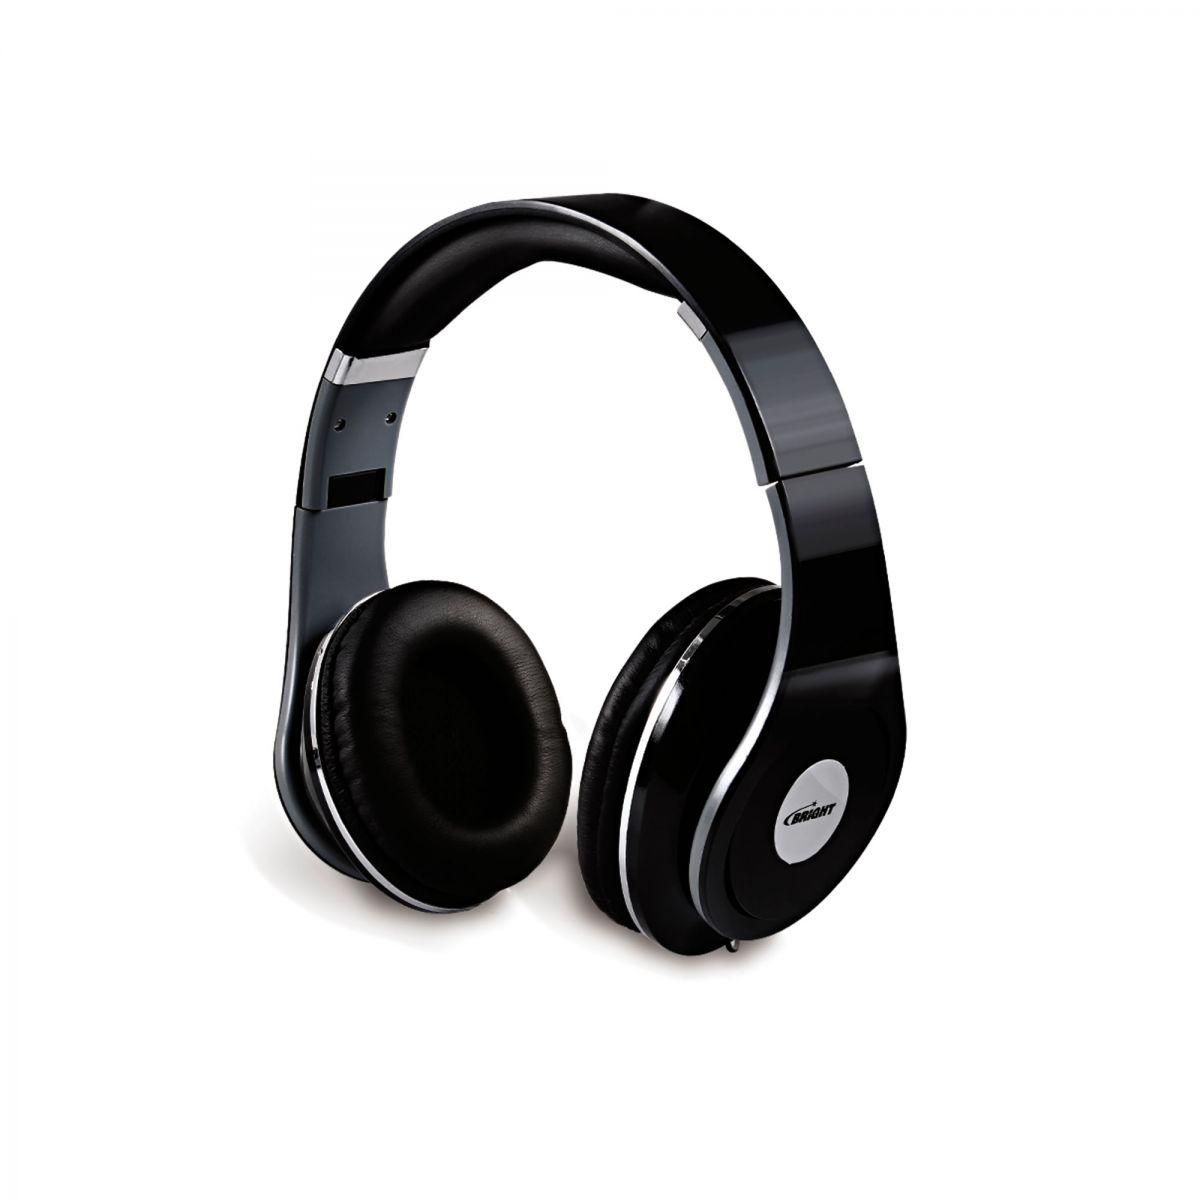 Fone de Ouvido Headphone Bootz Preto 32 Ohms 0300 Bright